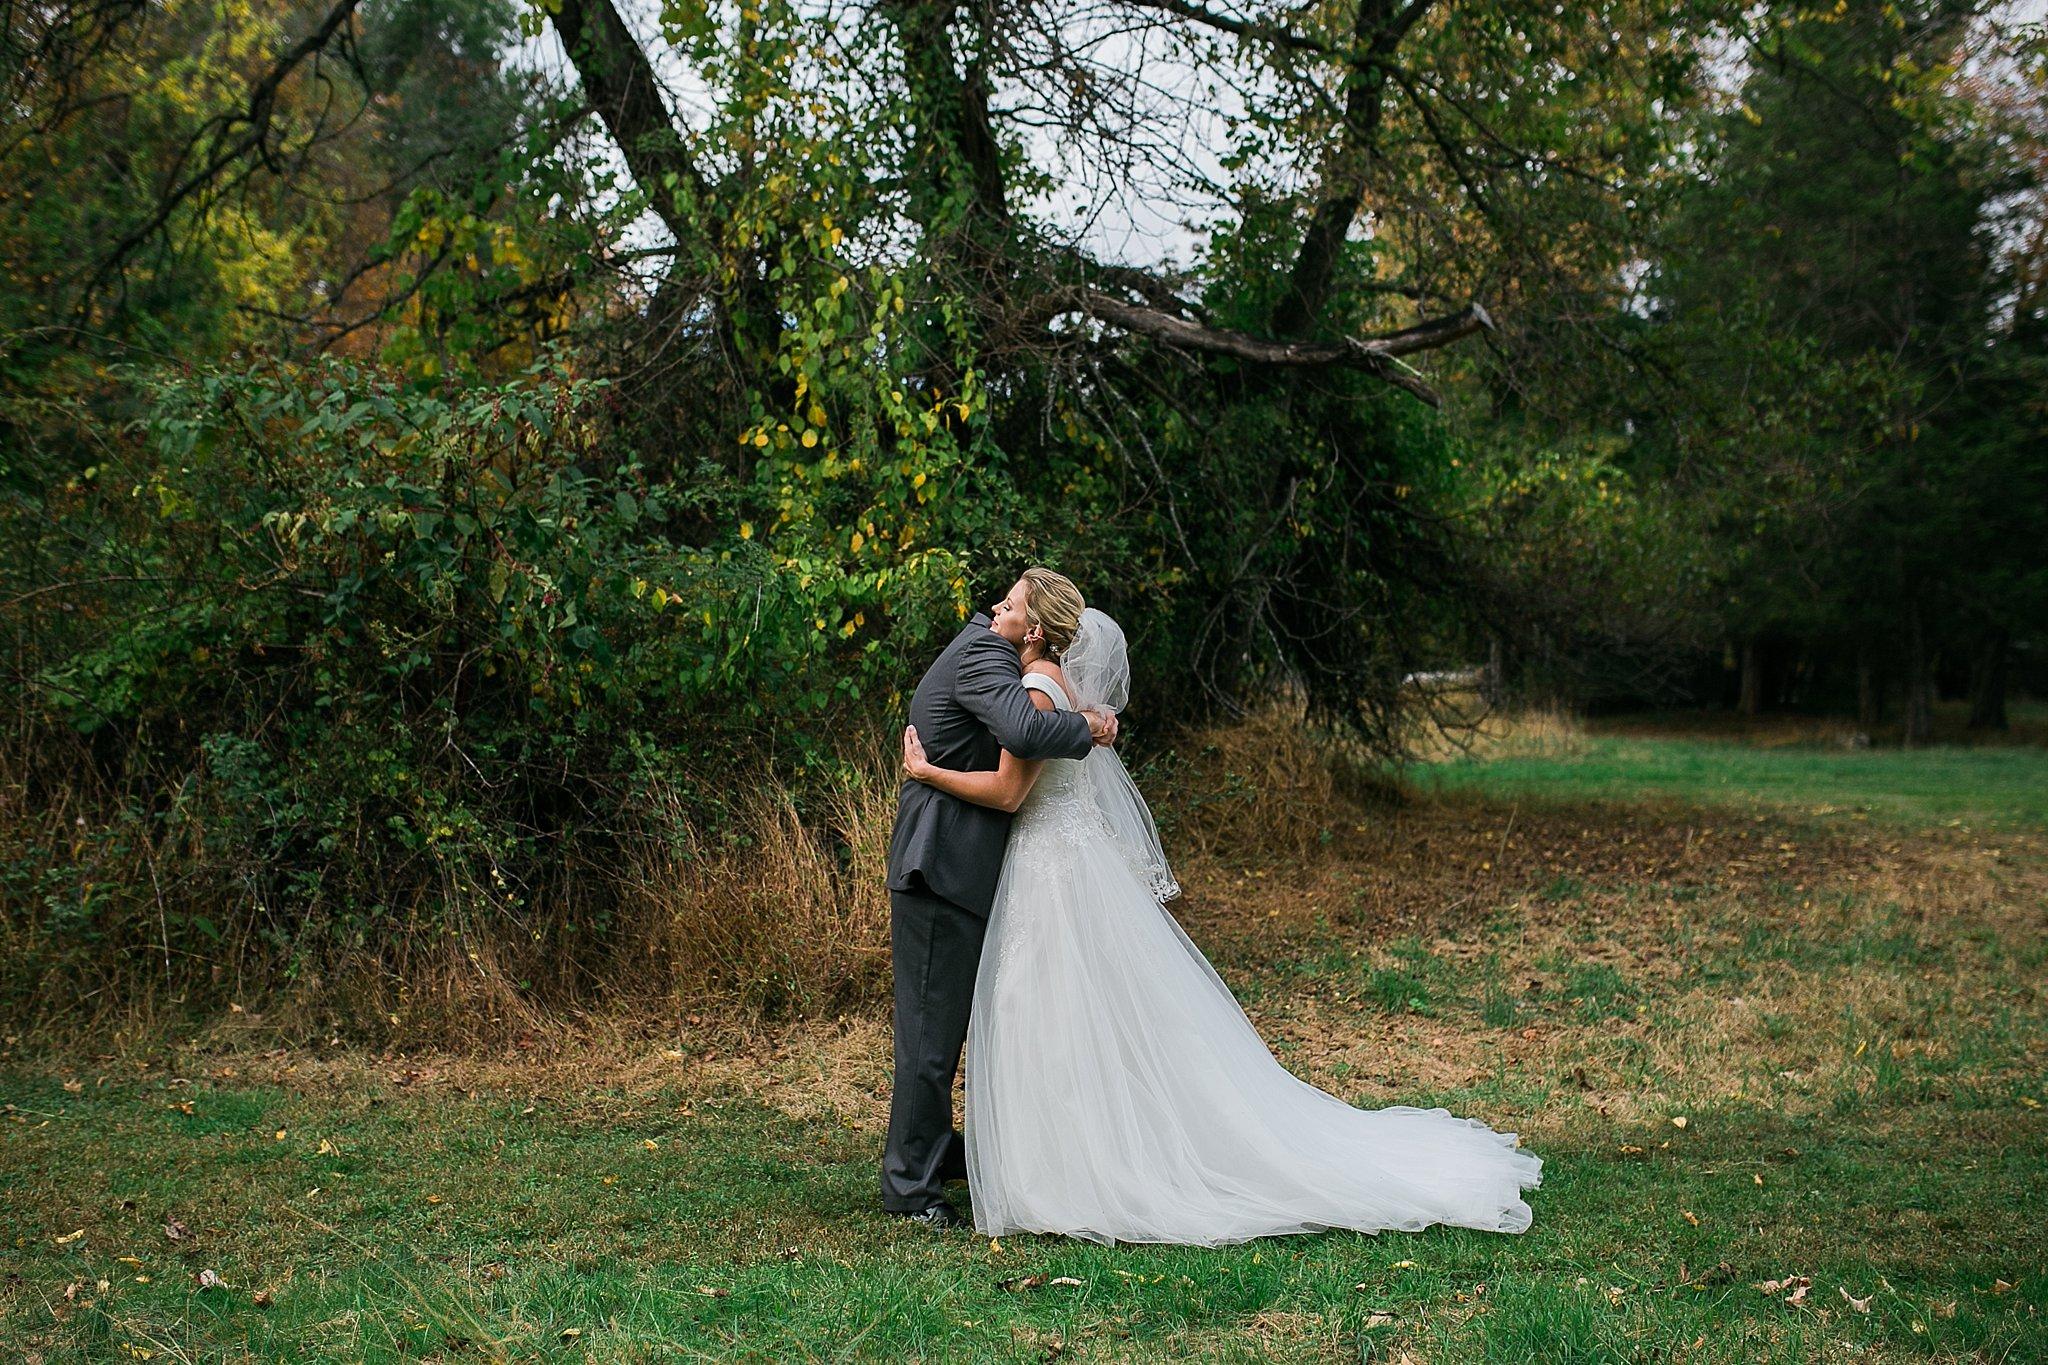 New Windsor New York Hudson Valley New York Wedding Photographer 22.jpg